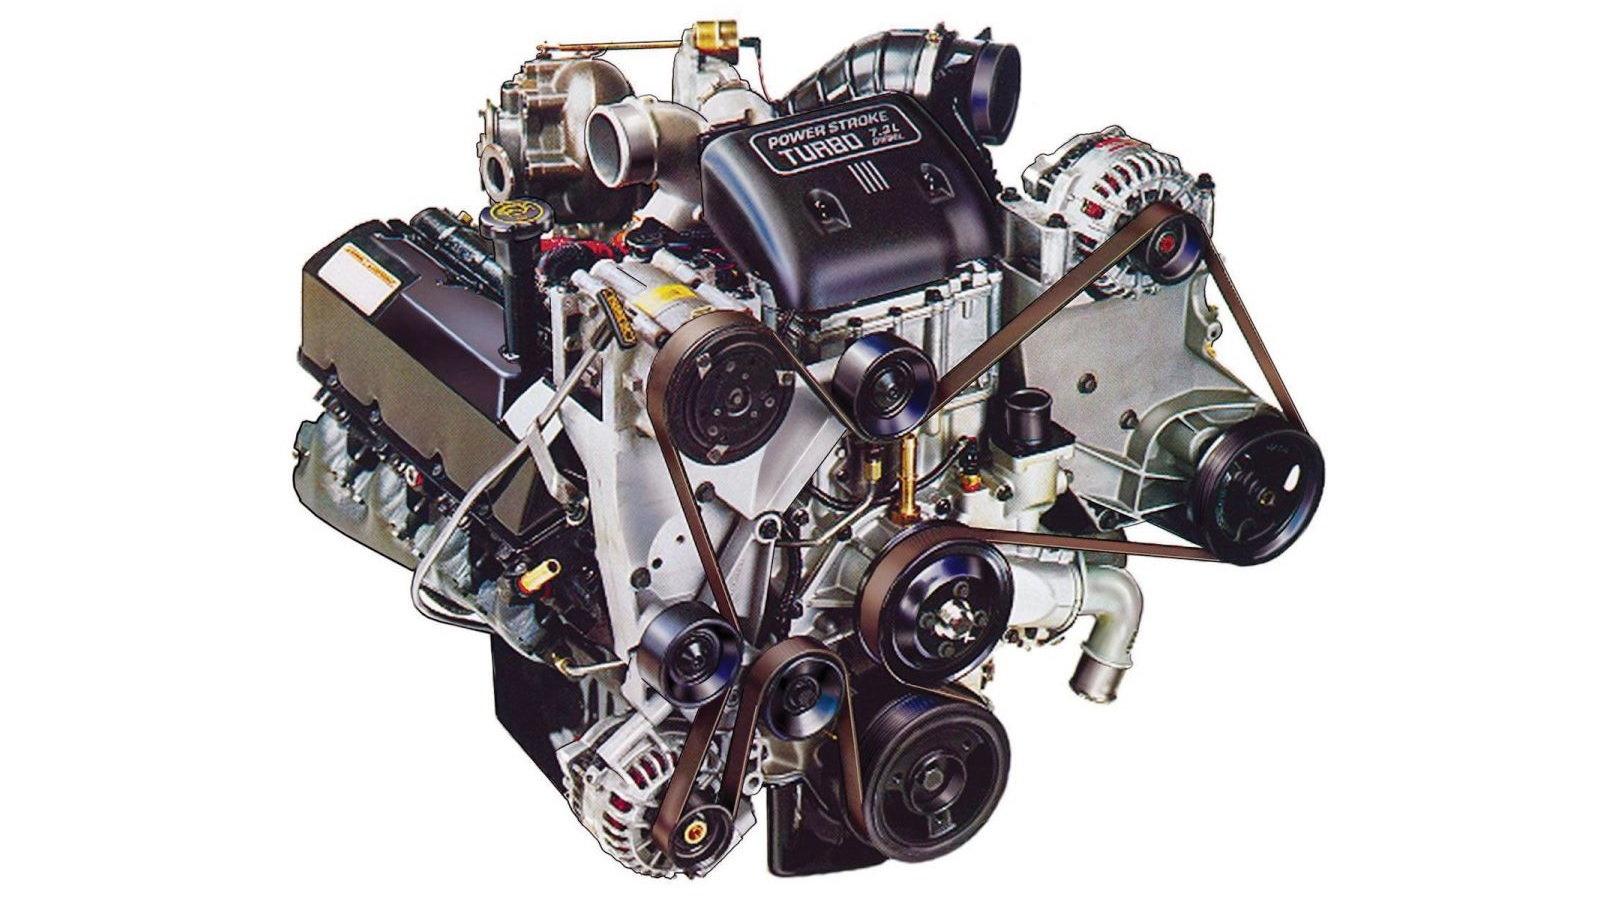 9. Ford 7.3 Liter PowerStroke Turbo Diesel